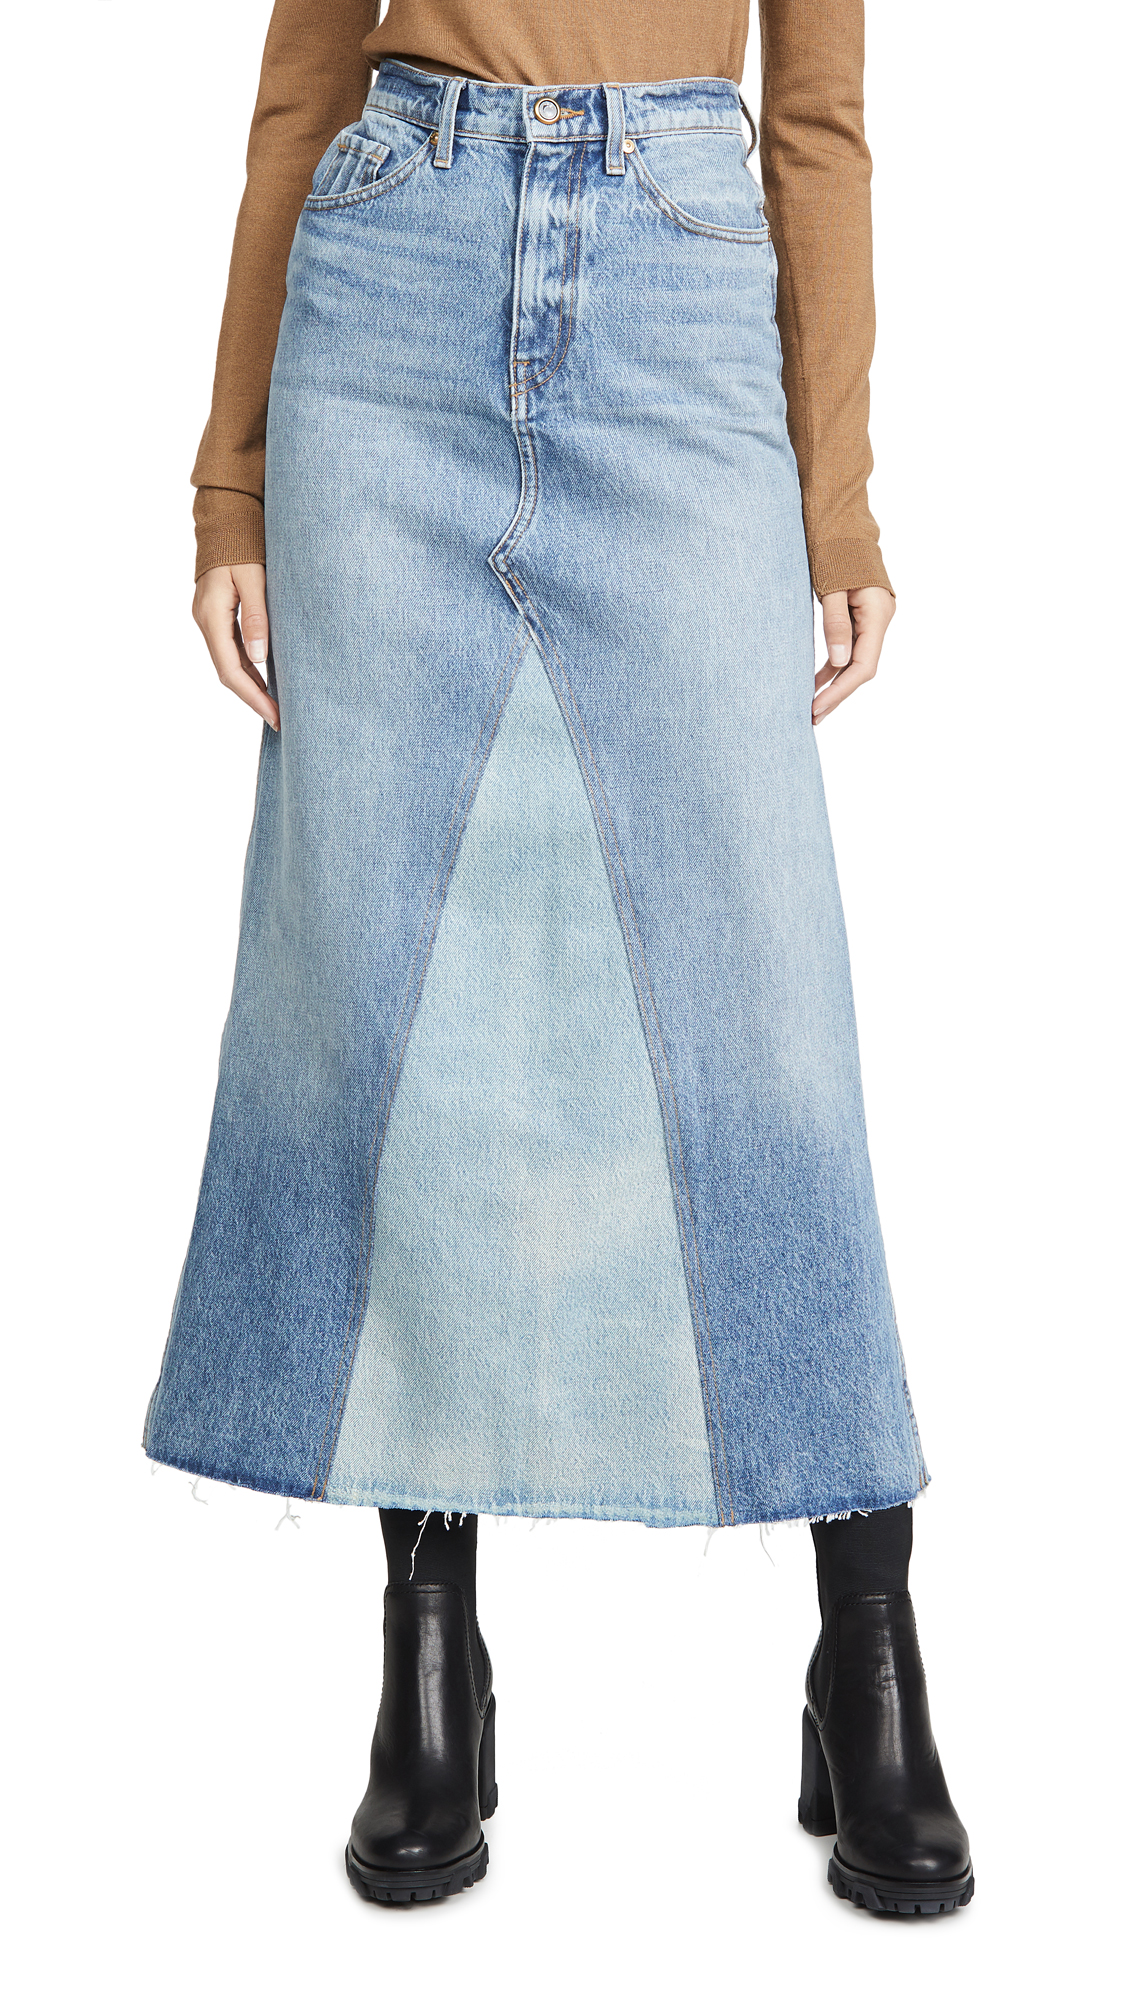 Khaite Magdalena Reconstructed Long Skirt